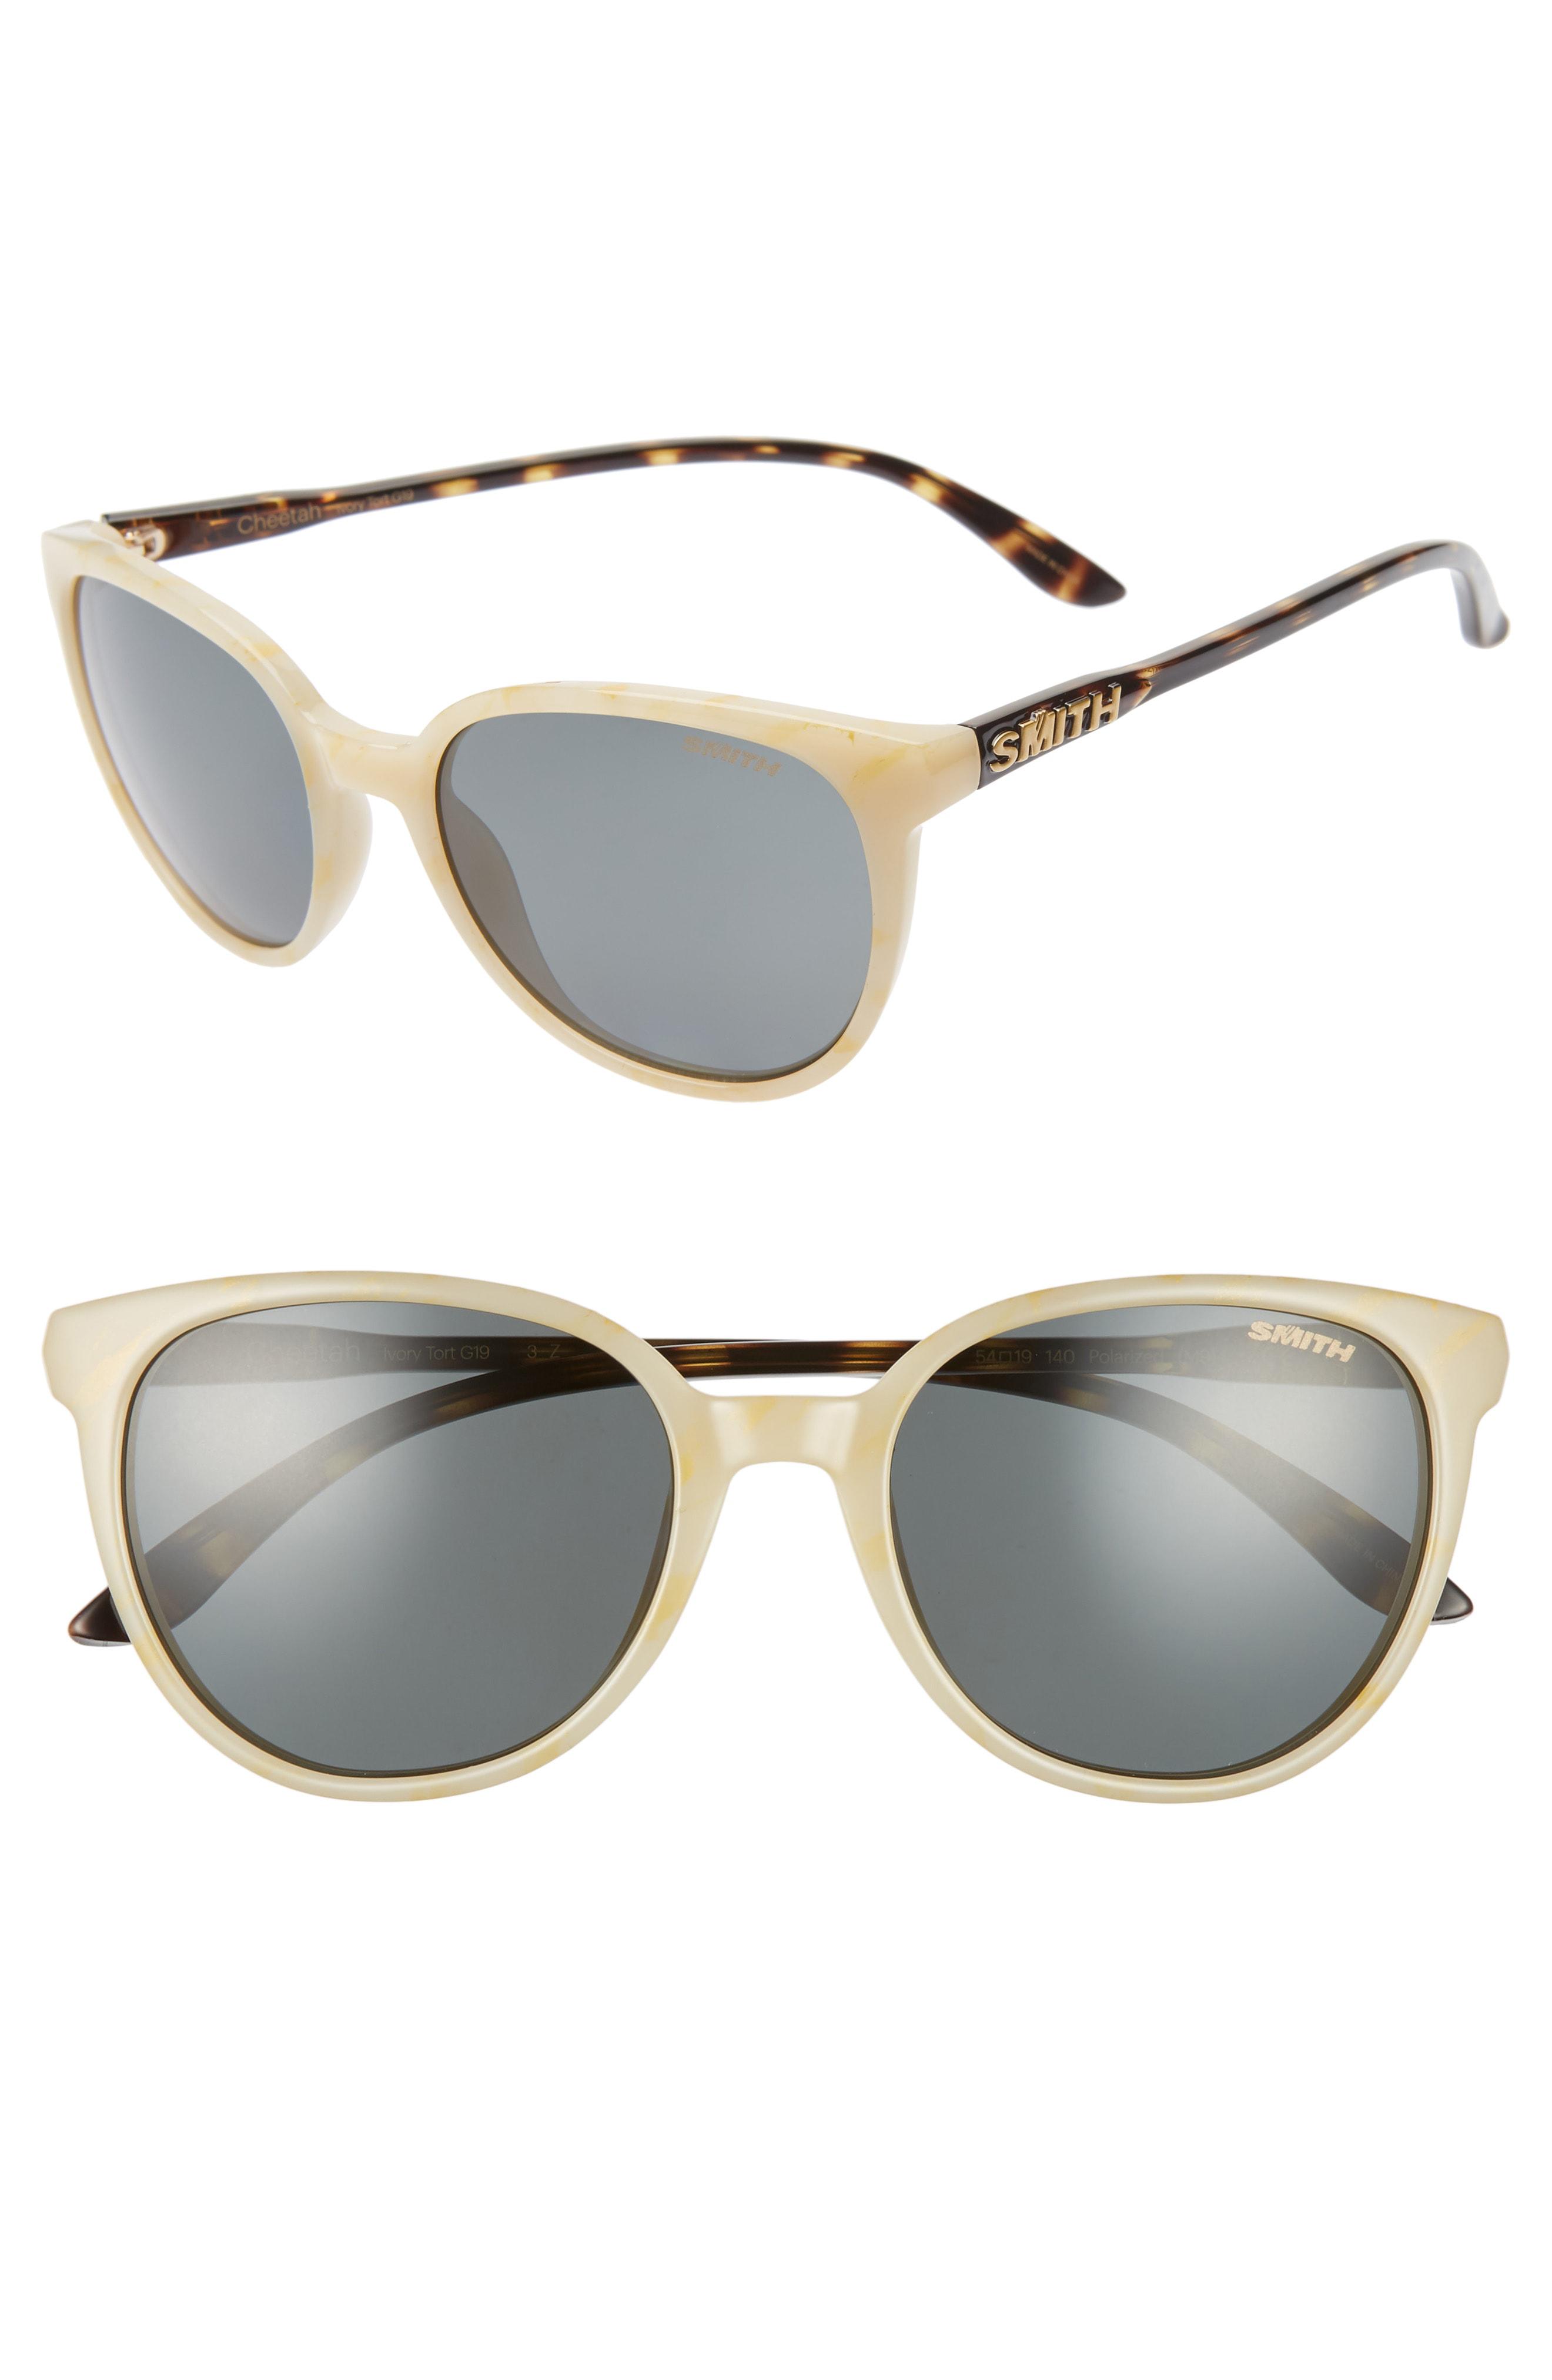 Smith Cheetah 54mm Chromapop(tm) Polarized Round Sunglasses In Ivory Tortoise